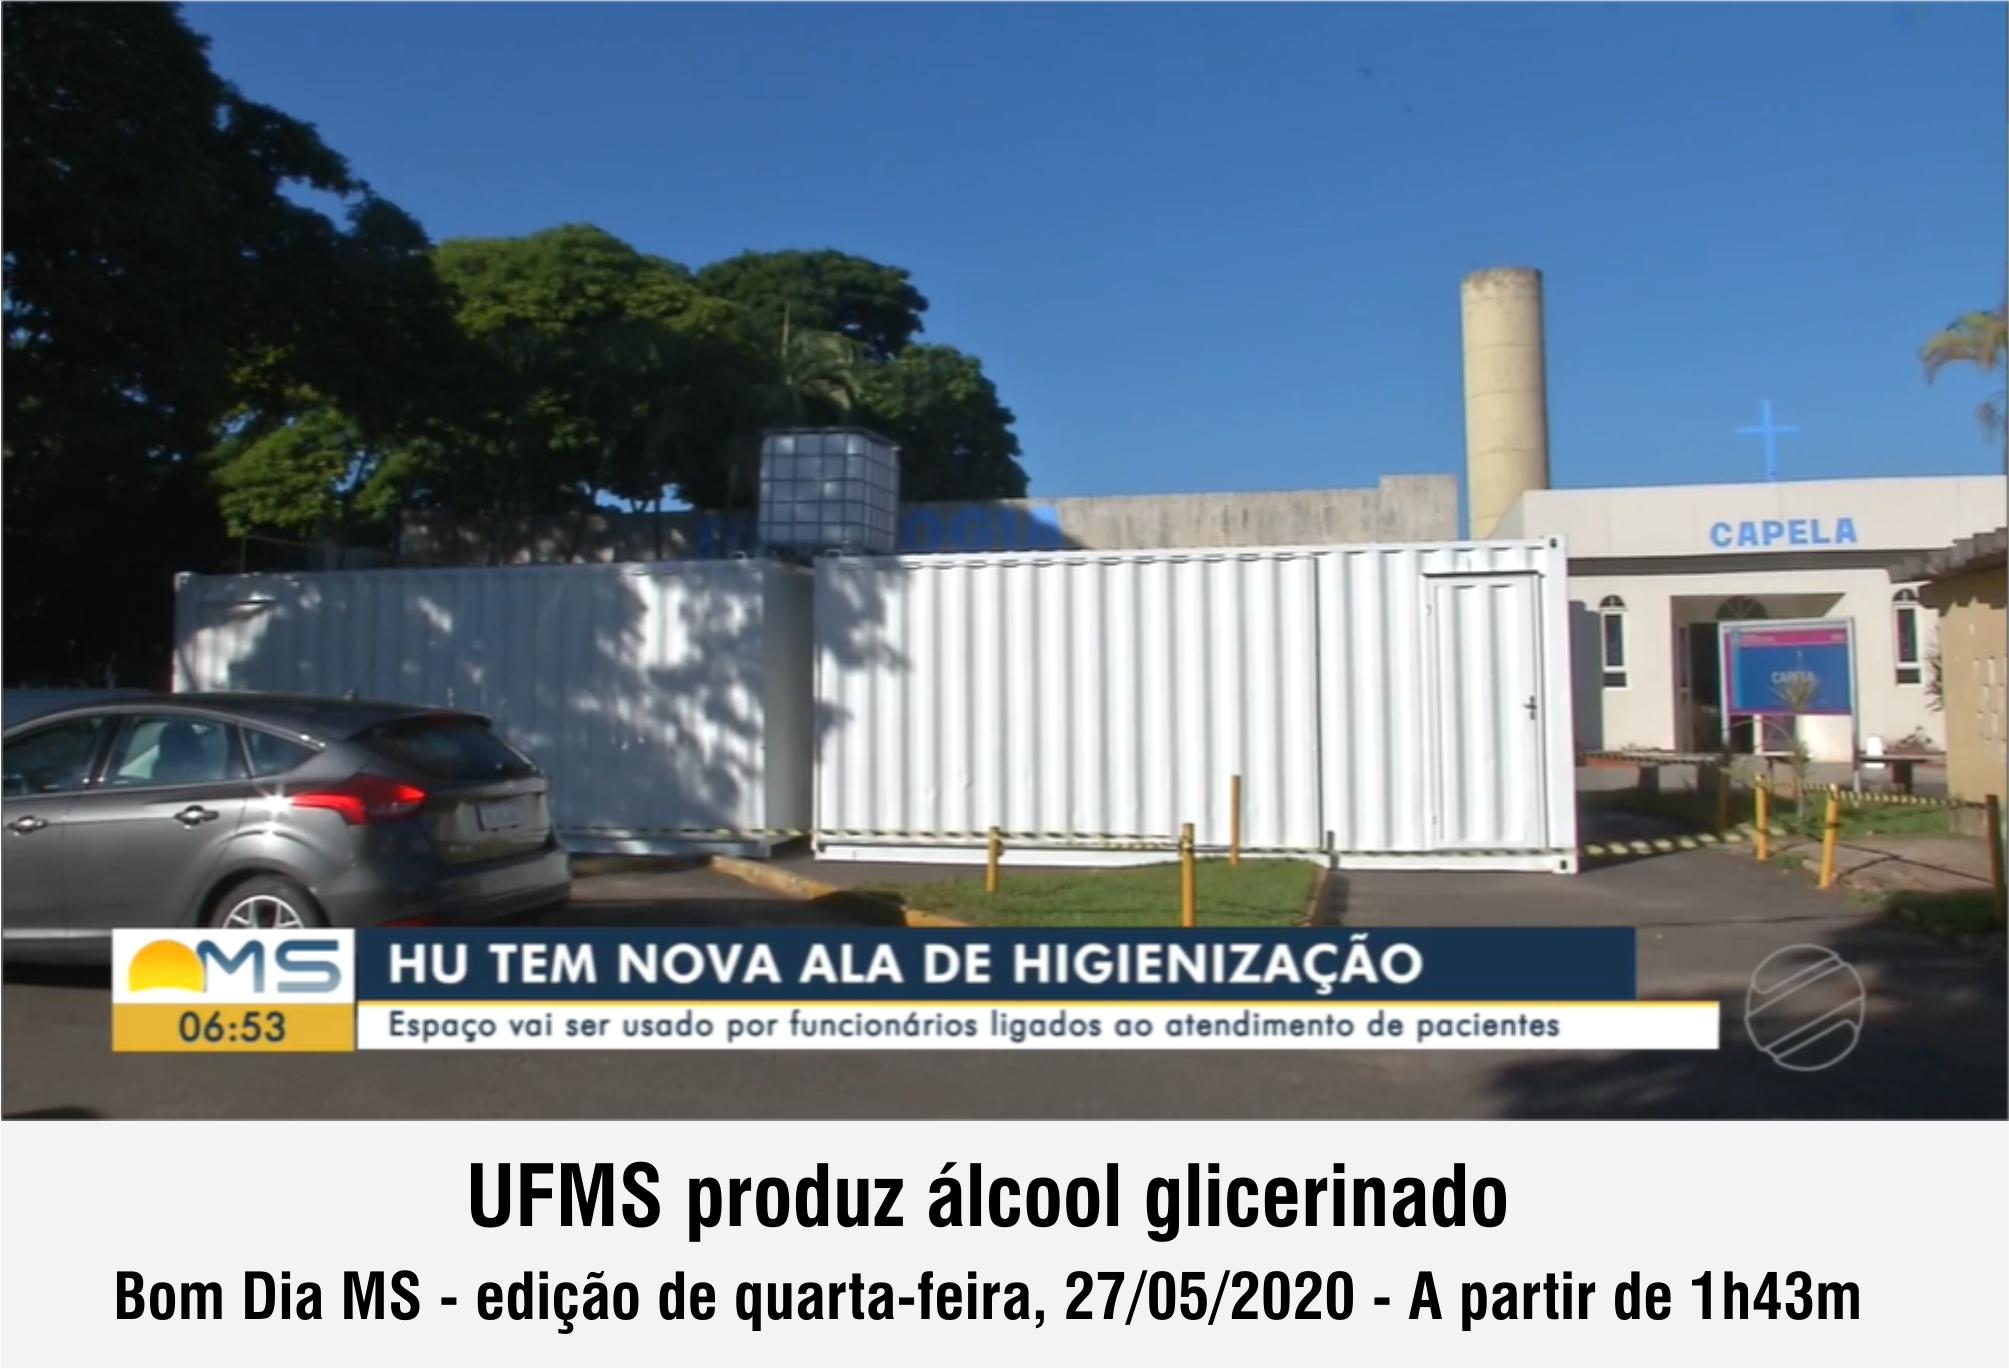 MSTV - UFMS produz álcool glicerinado